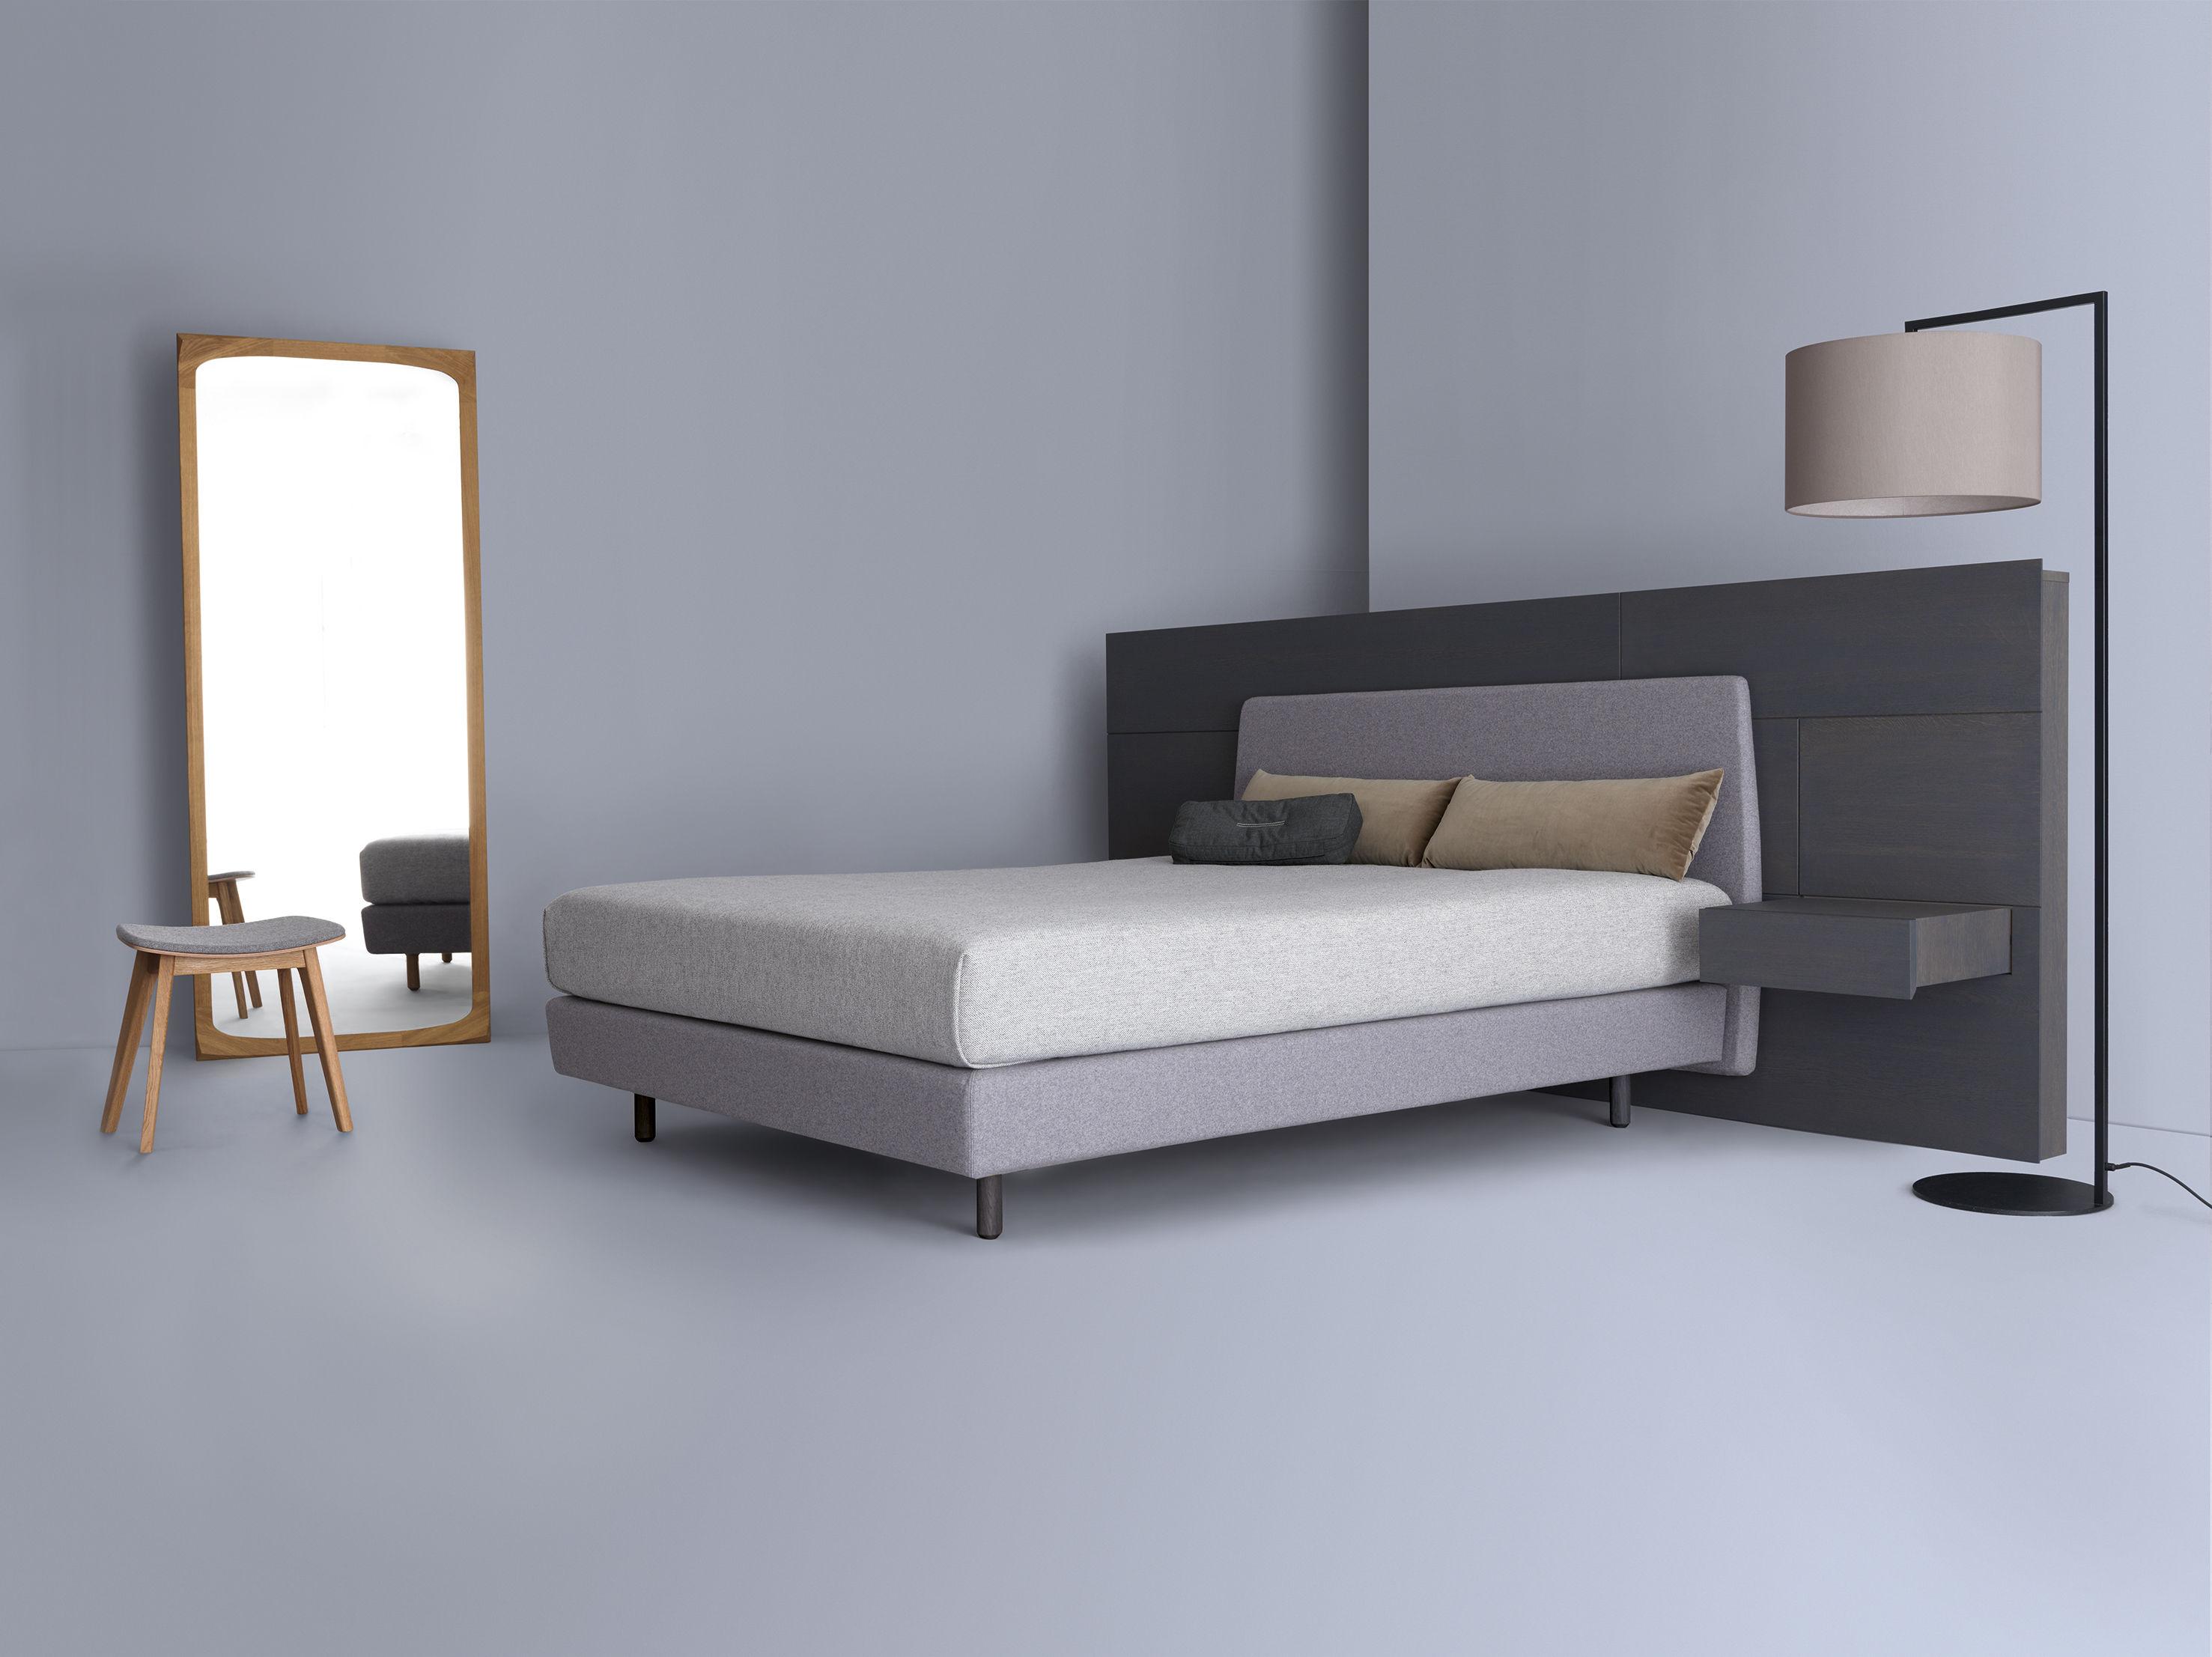 lampenschirm gestell lampenschirm gestell selber machen frisch lampen. Black Bedroom Furniture Sets. Home Design Ideas